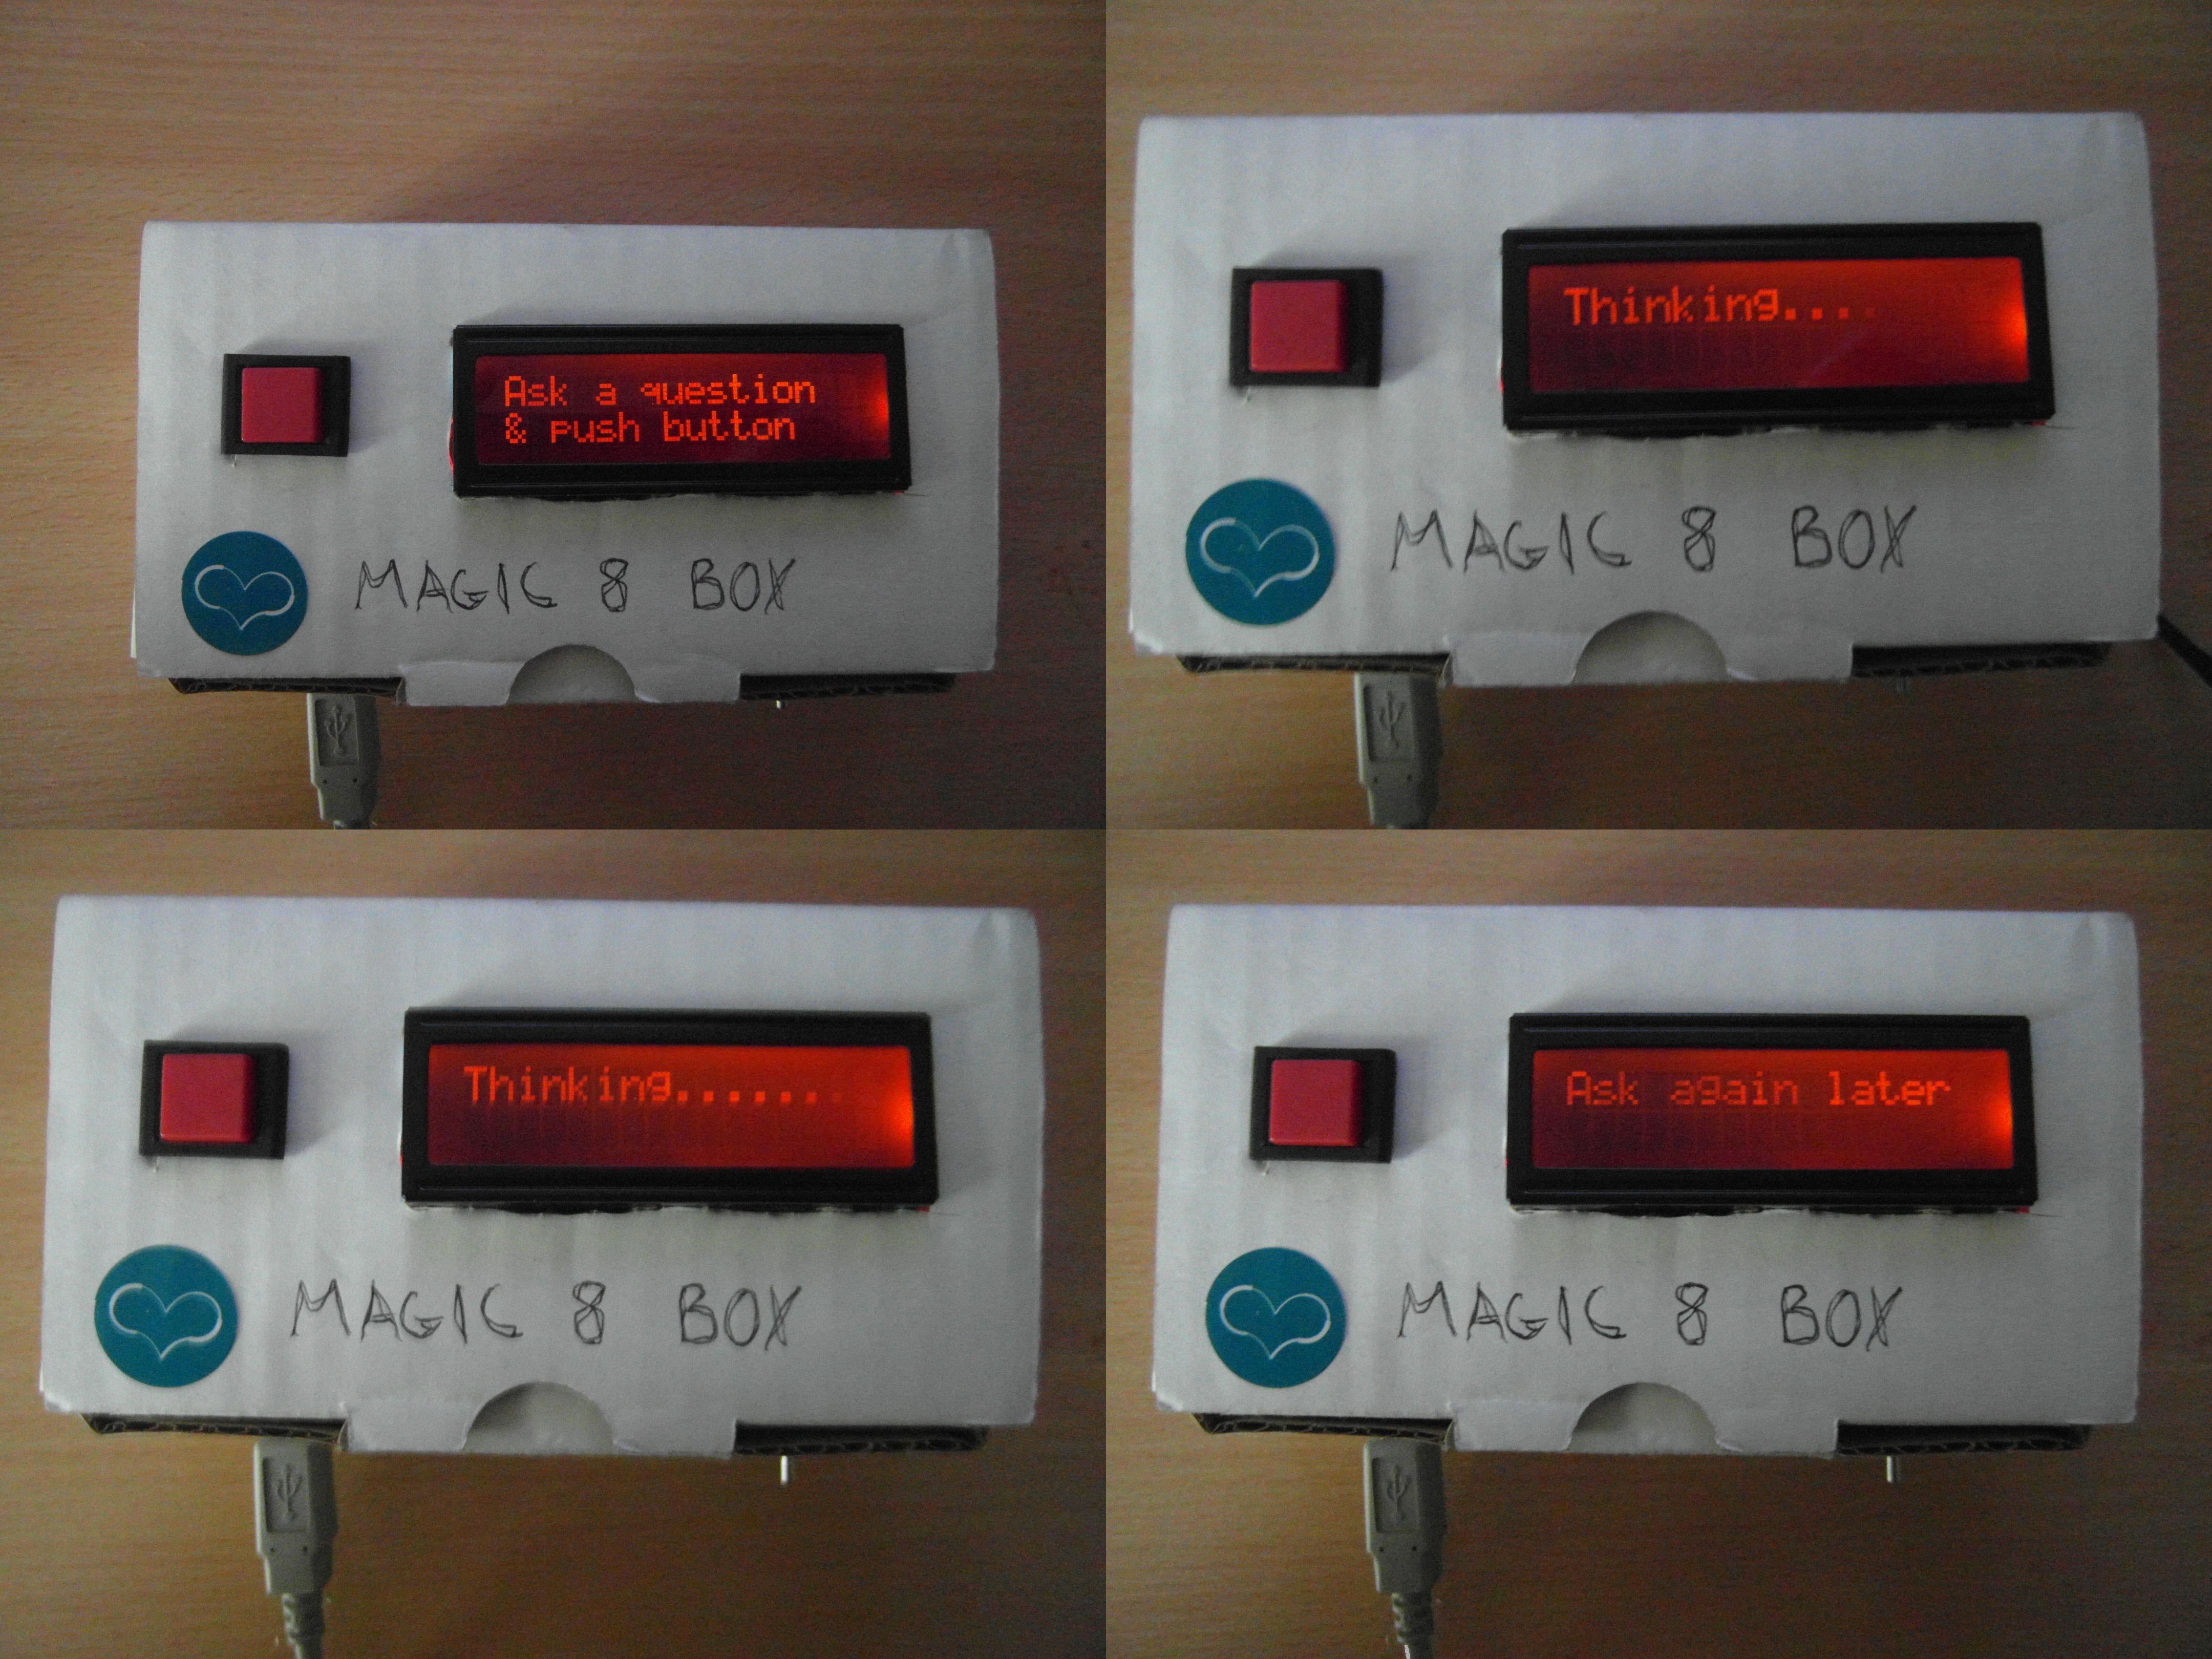 Magic 8 Box